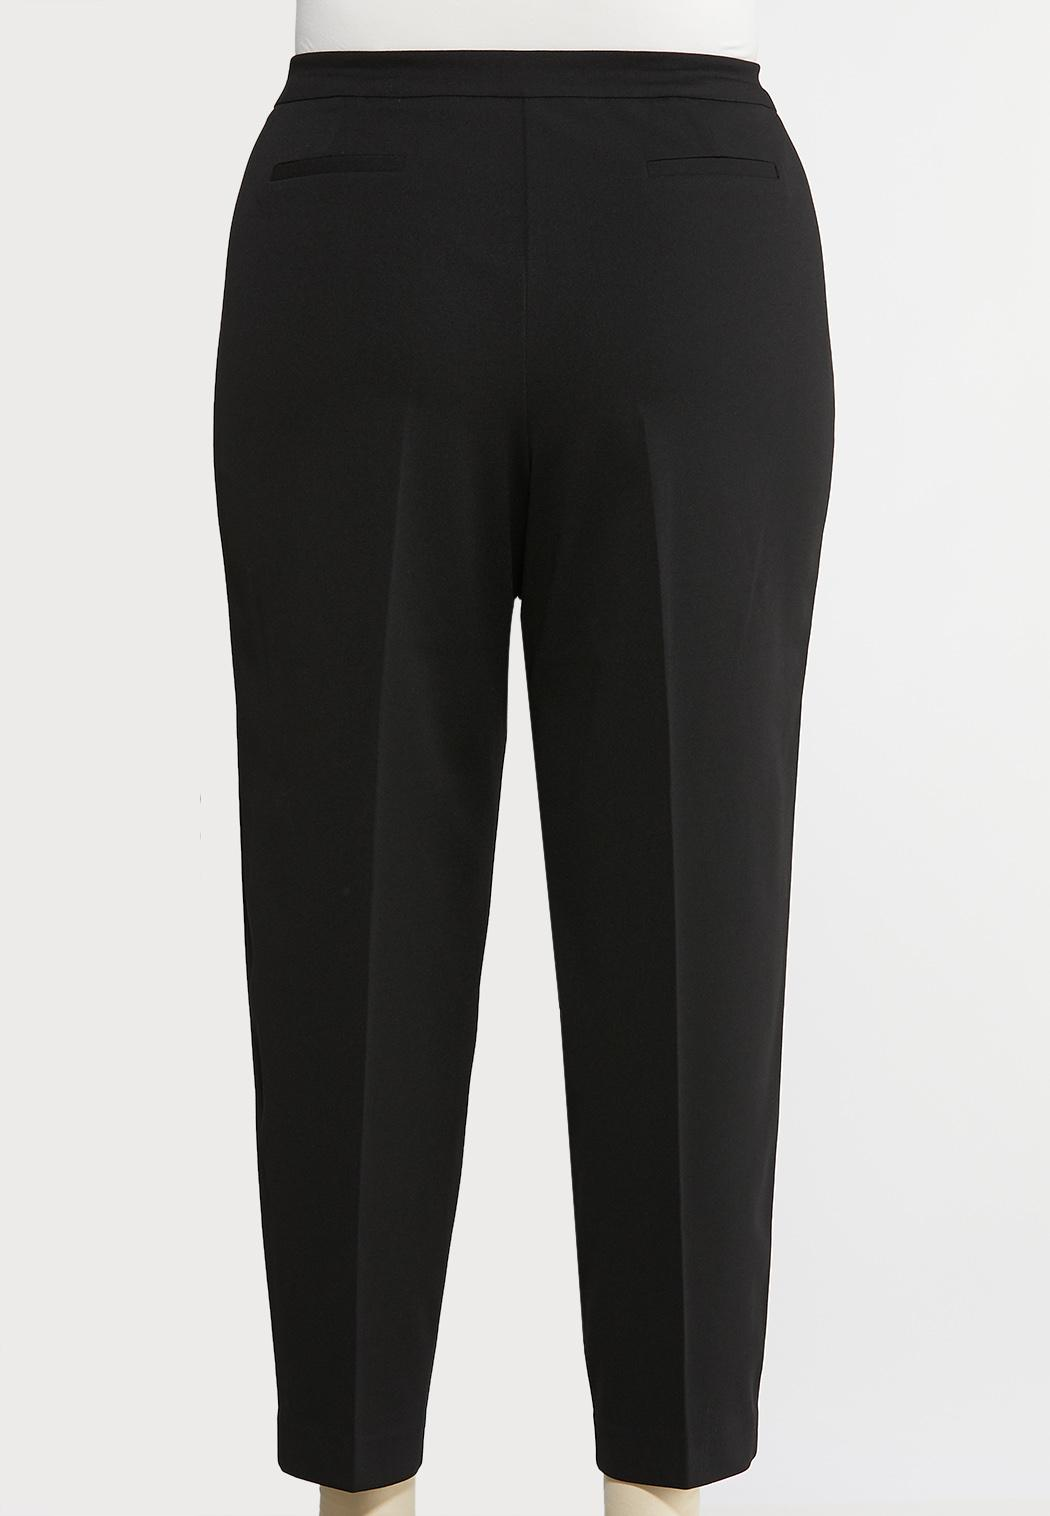 Plus Extended Slim Leg Dressy Knit Pants (Item #43892566)